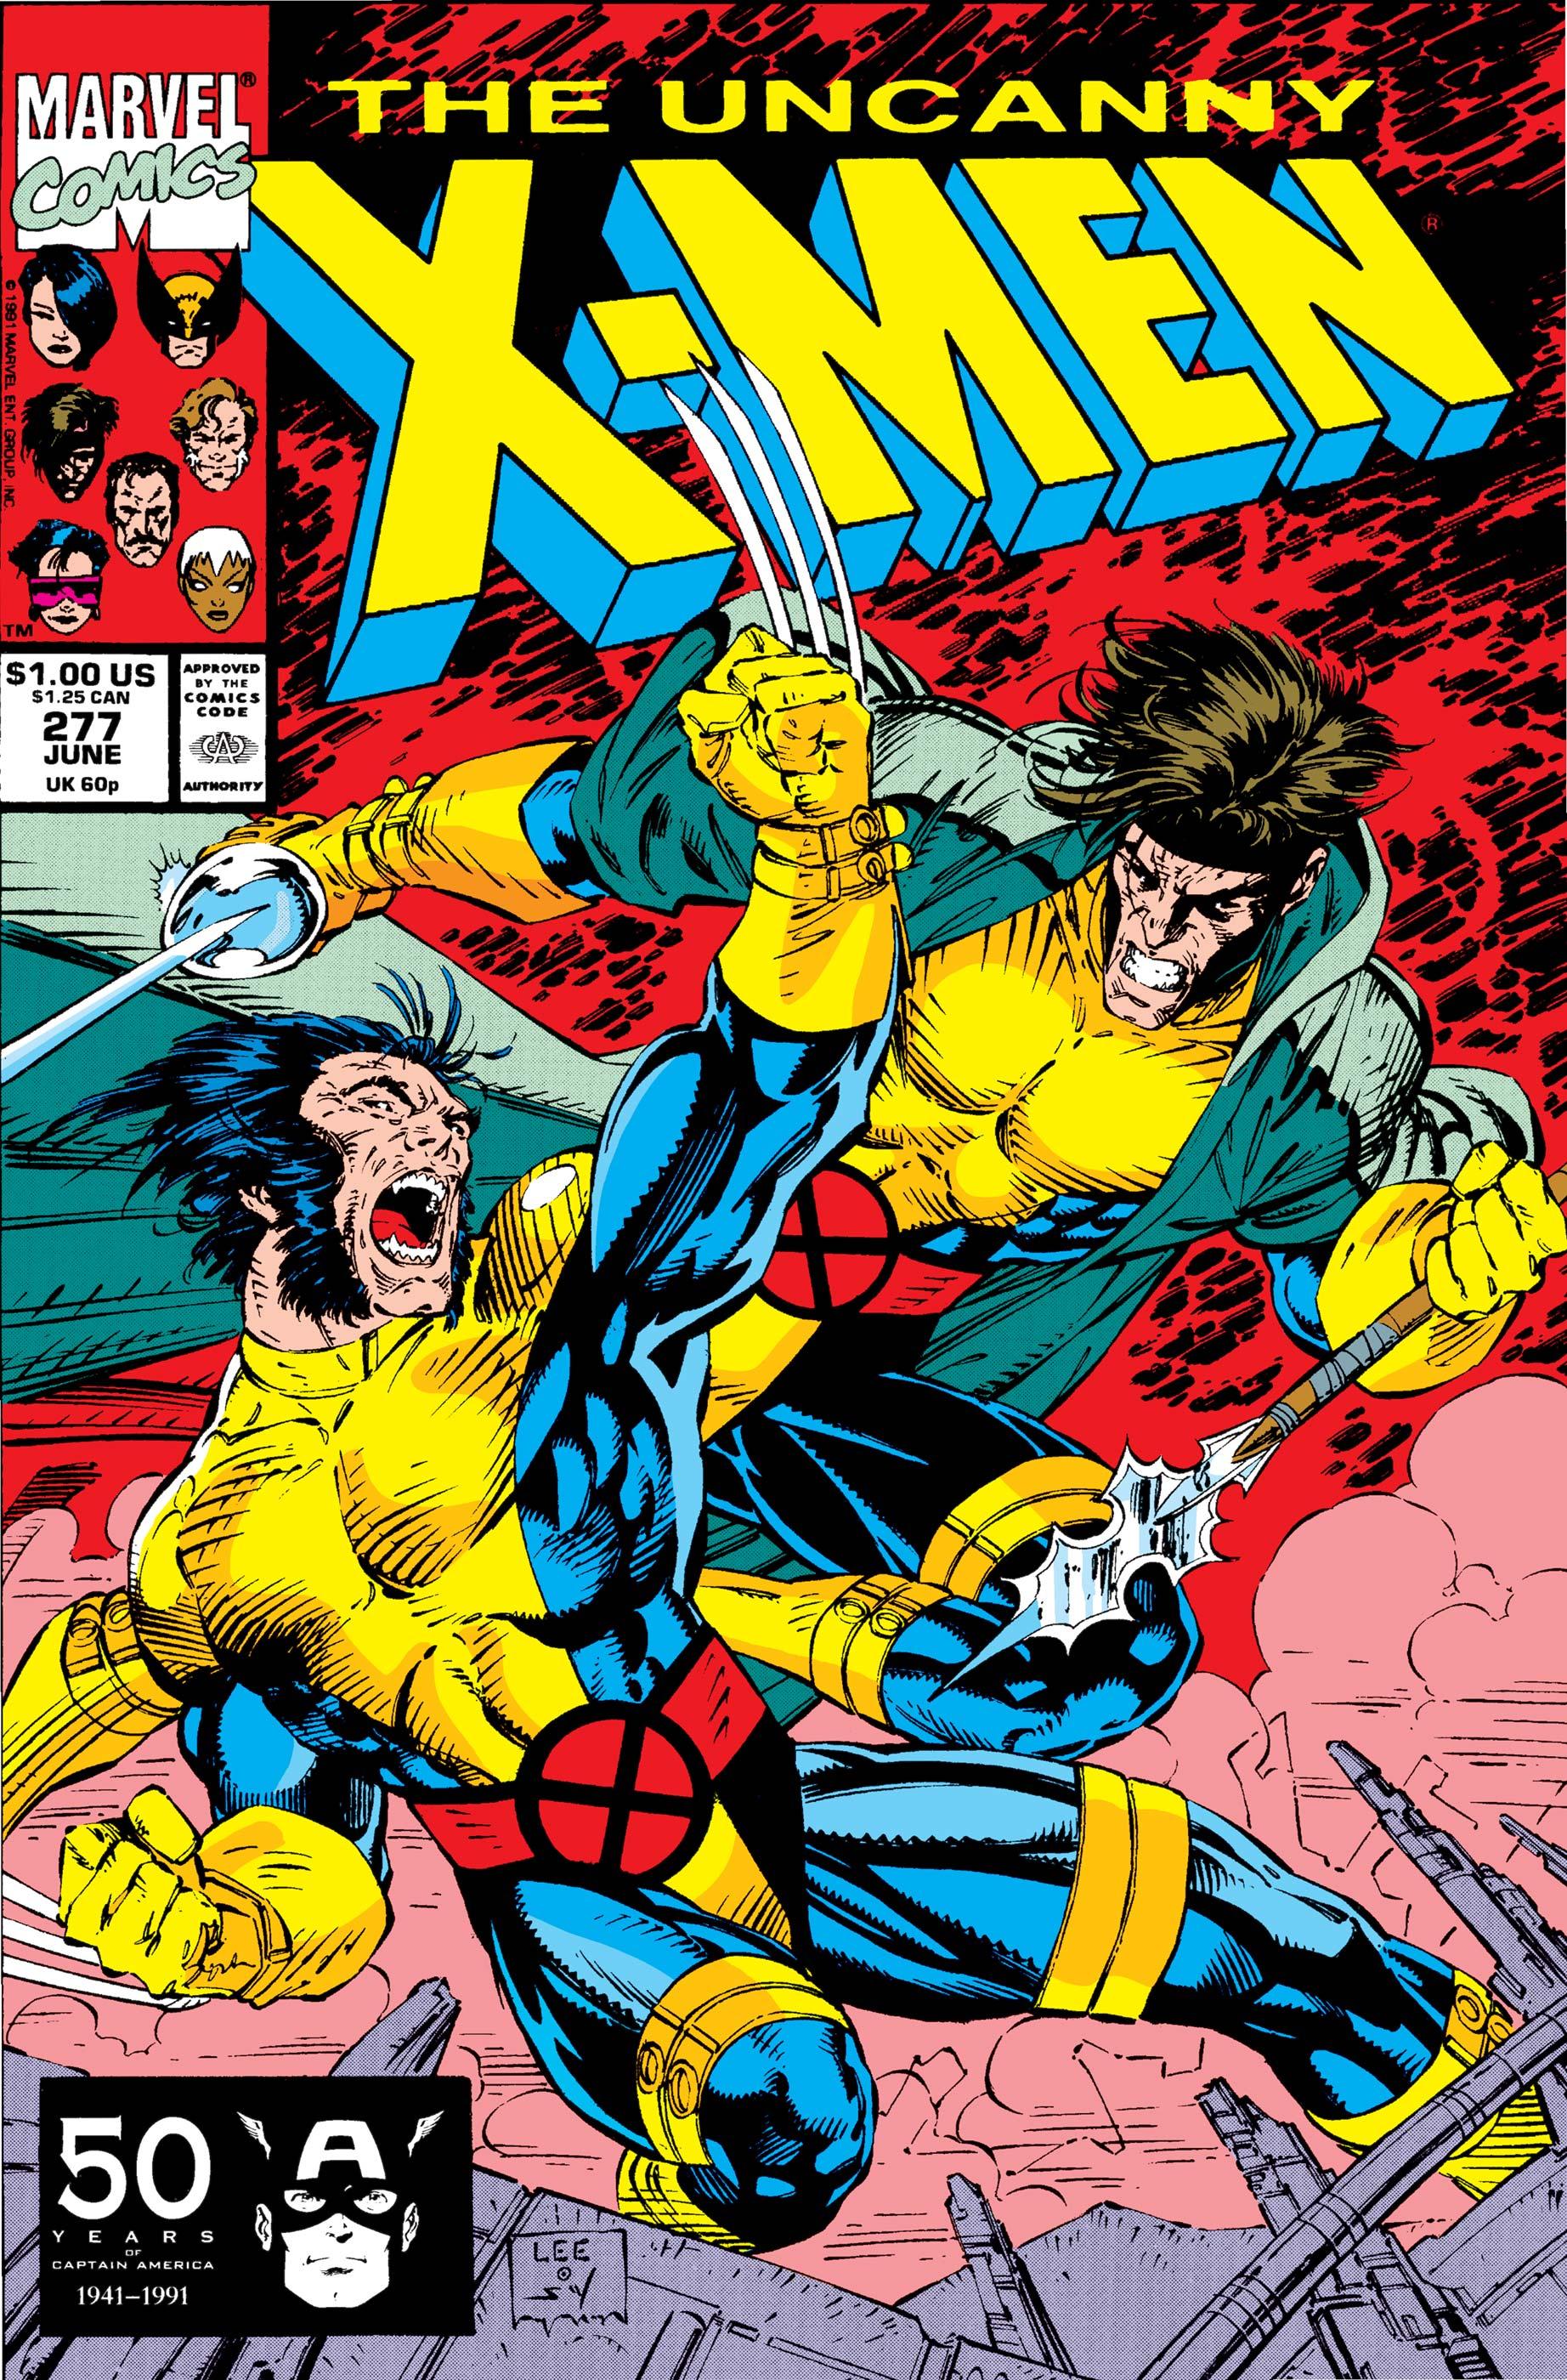 Uncanny X-Men (1963) #277